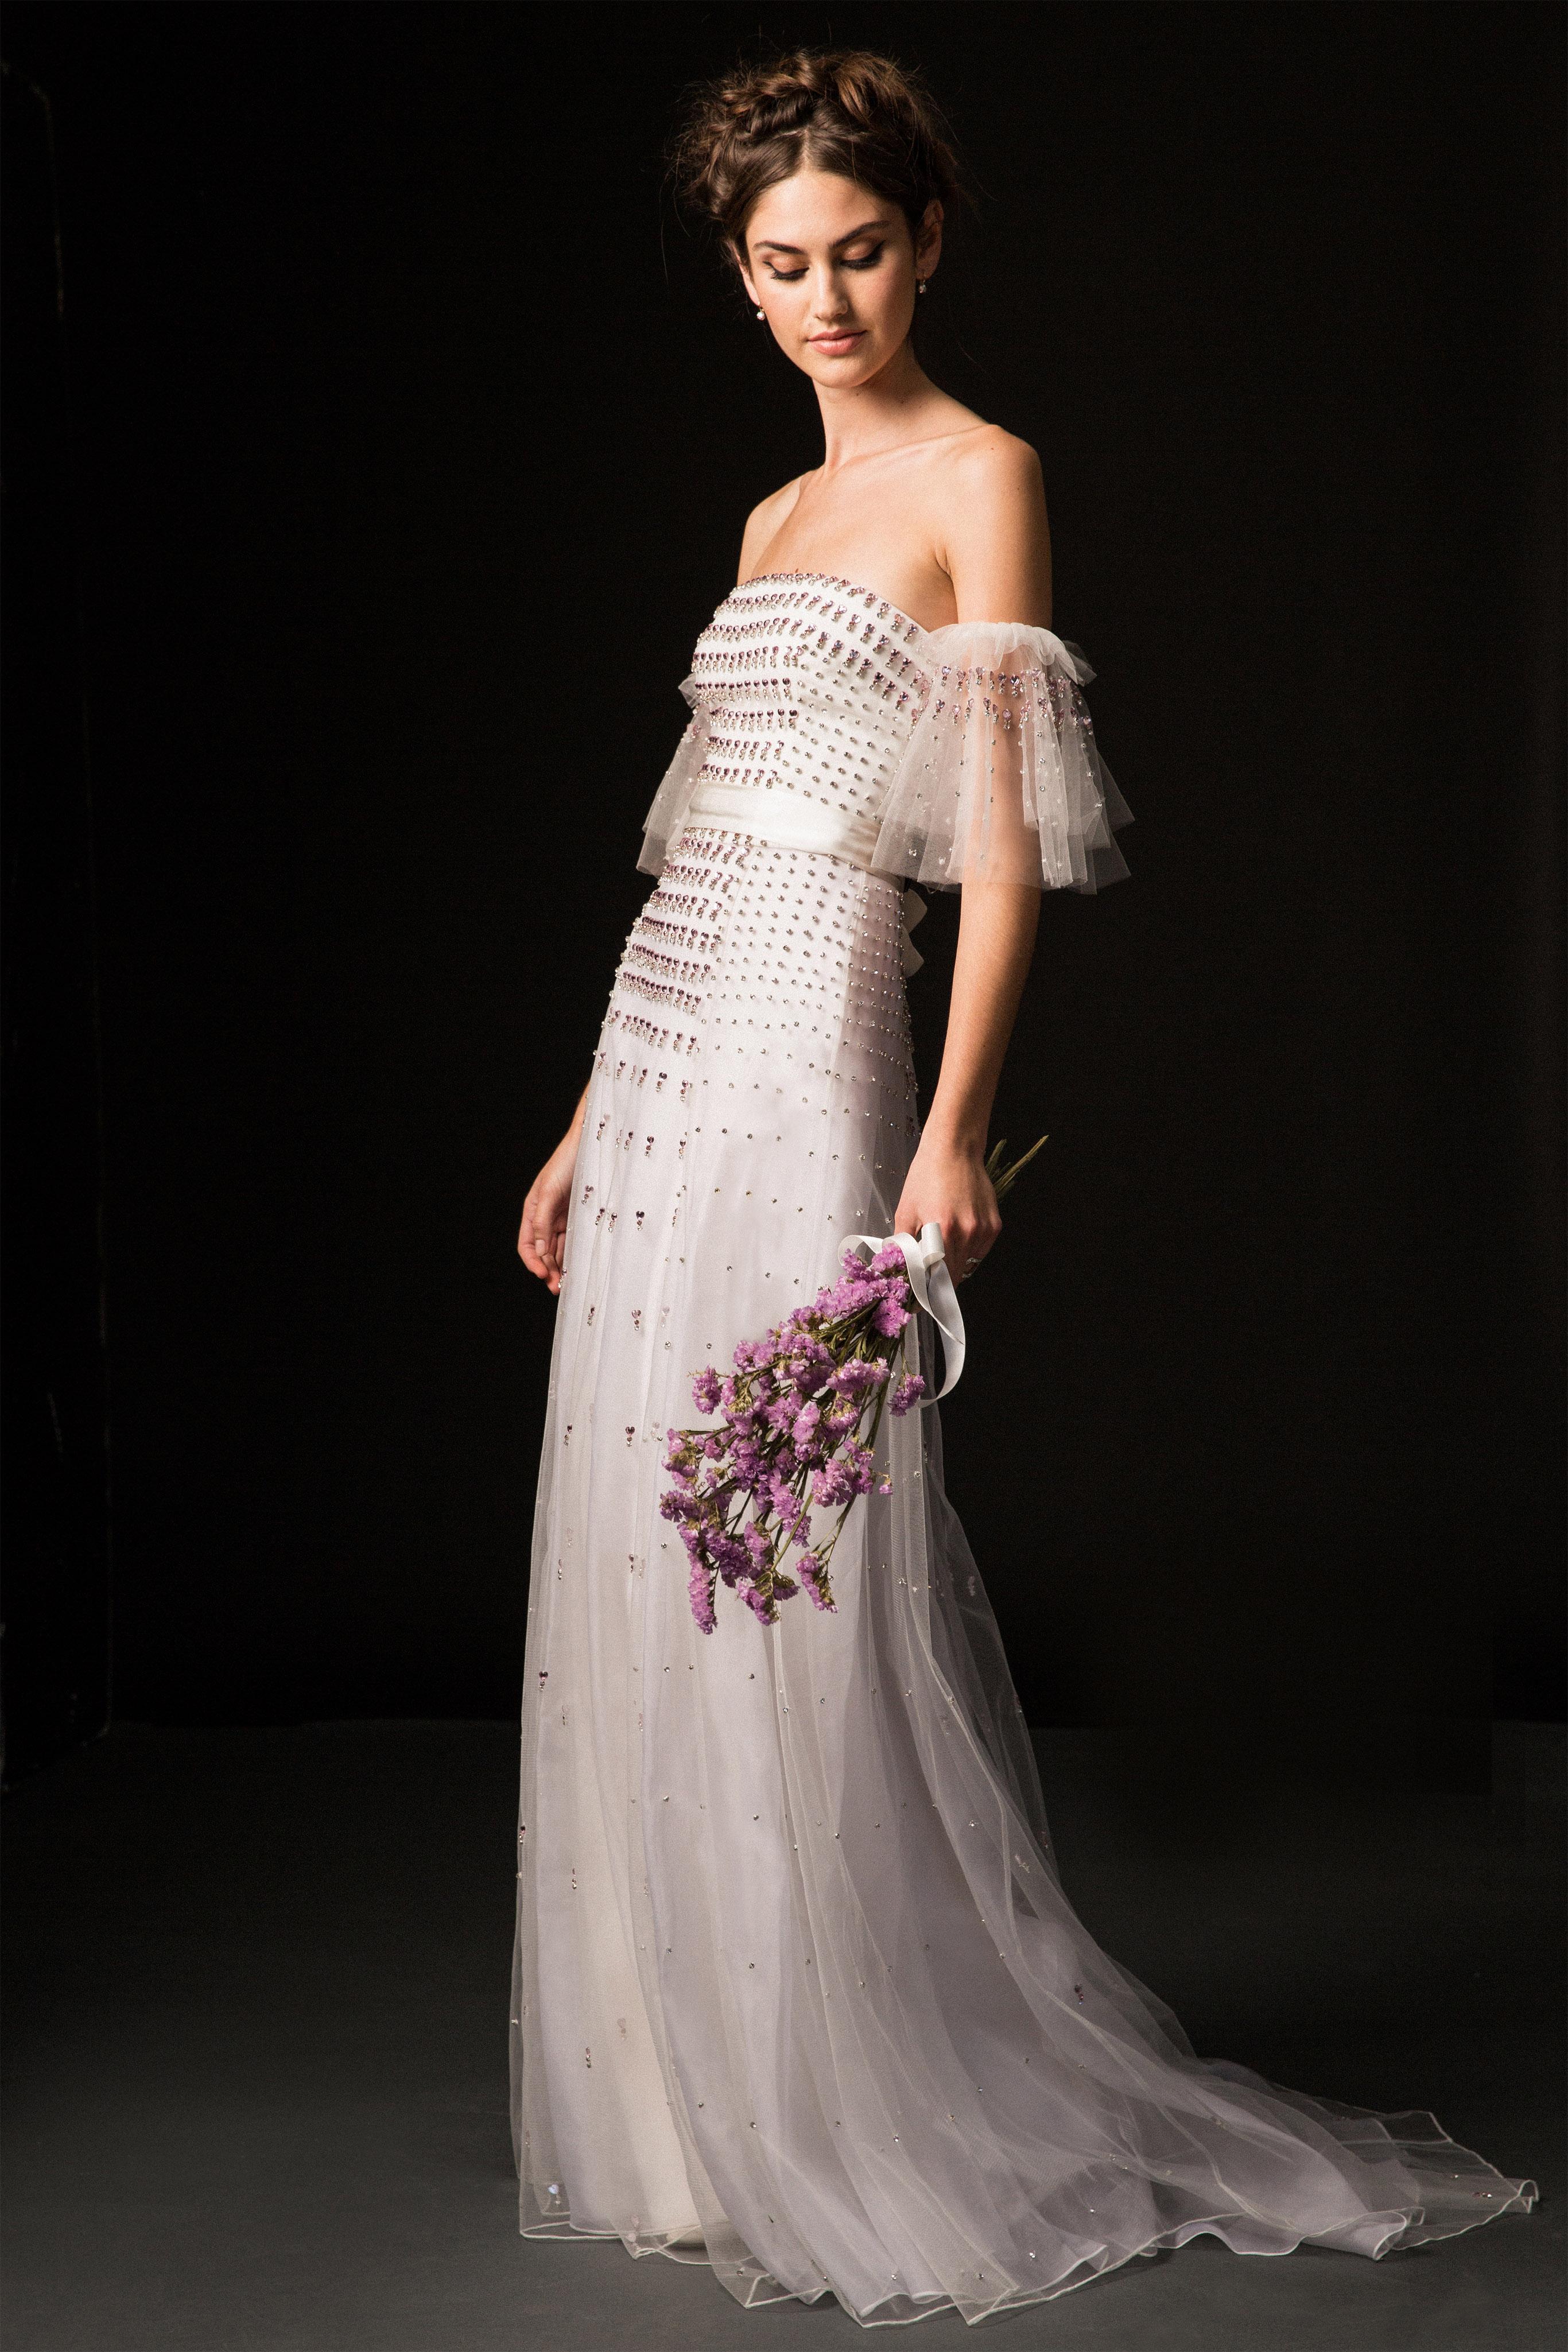 temperley fall 2019 over the shoulder beaded wedding dress